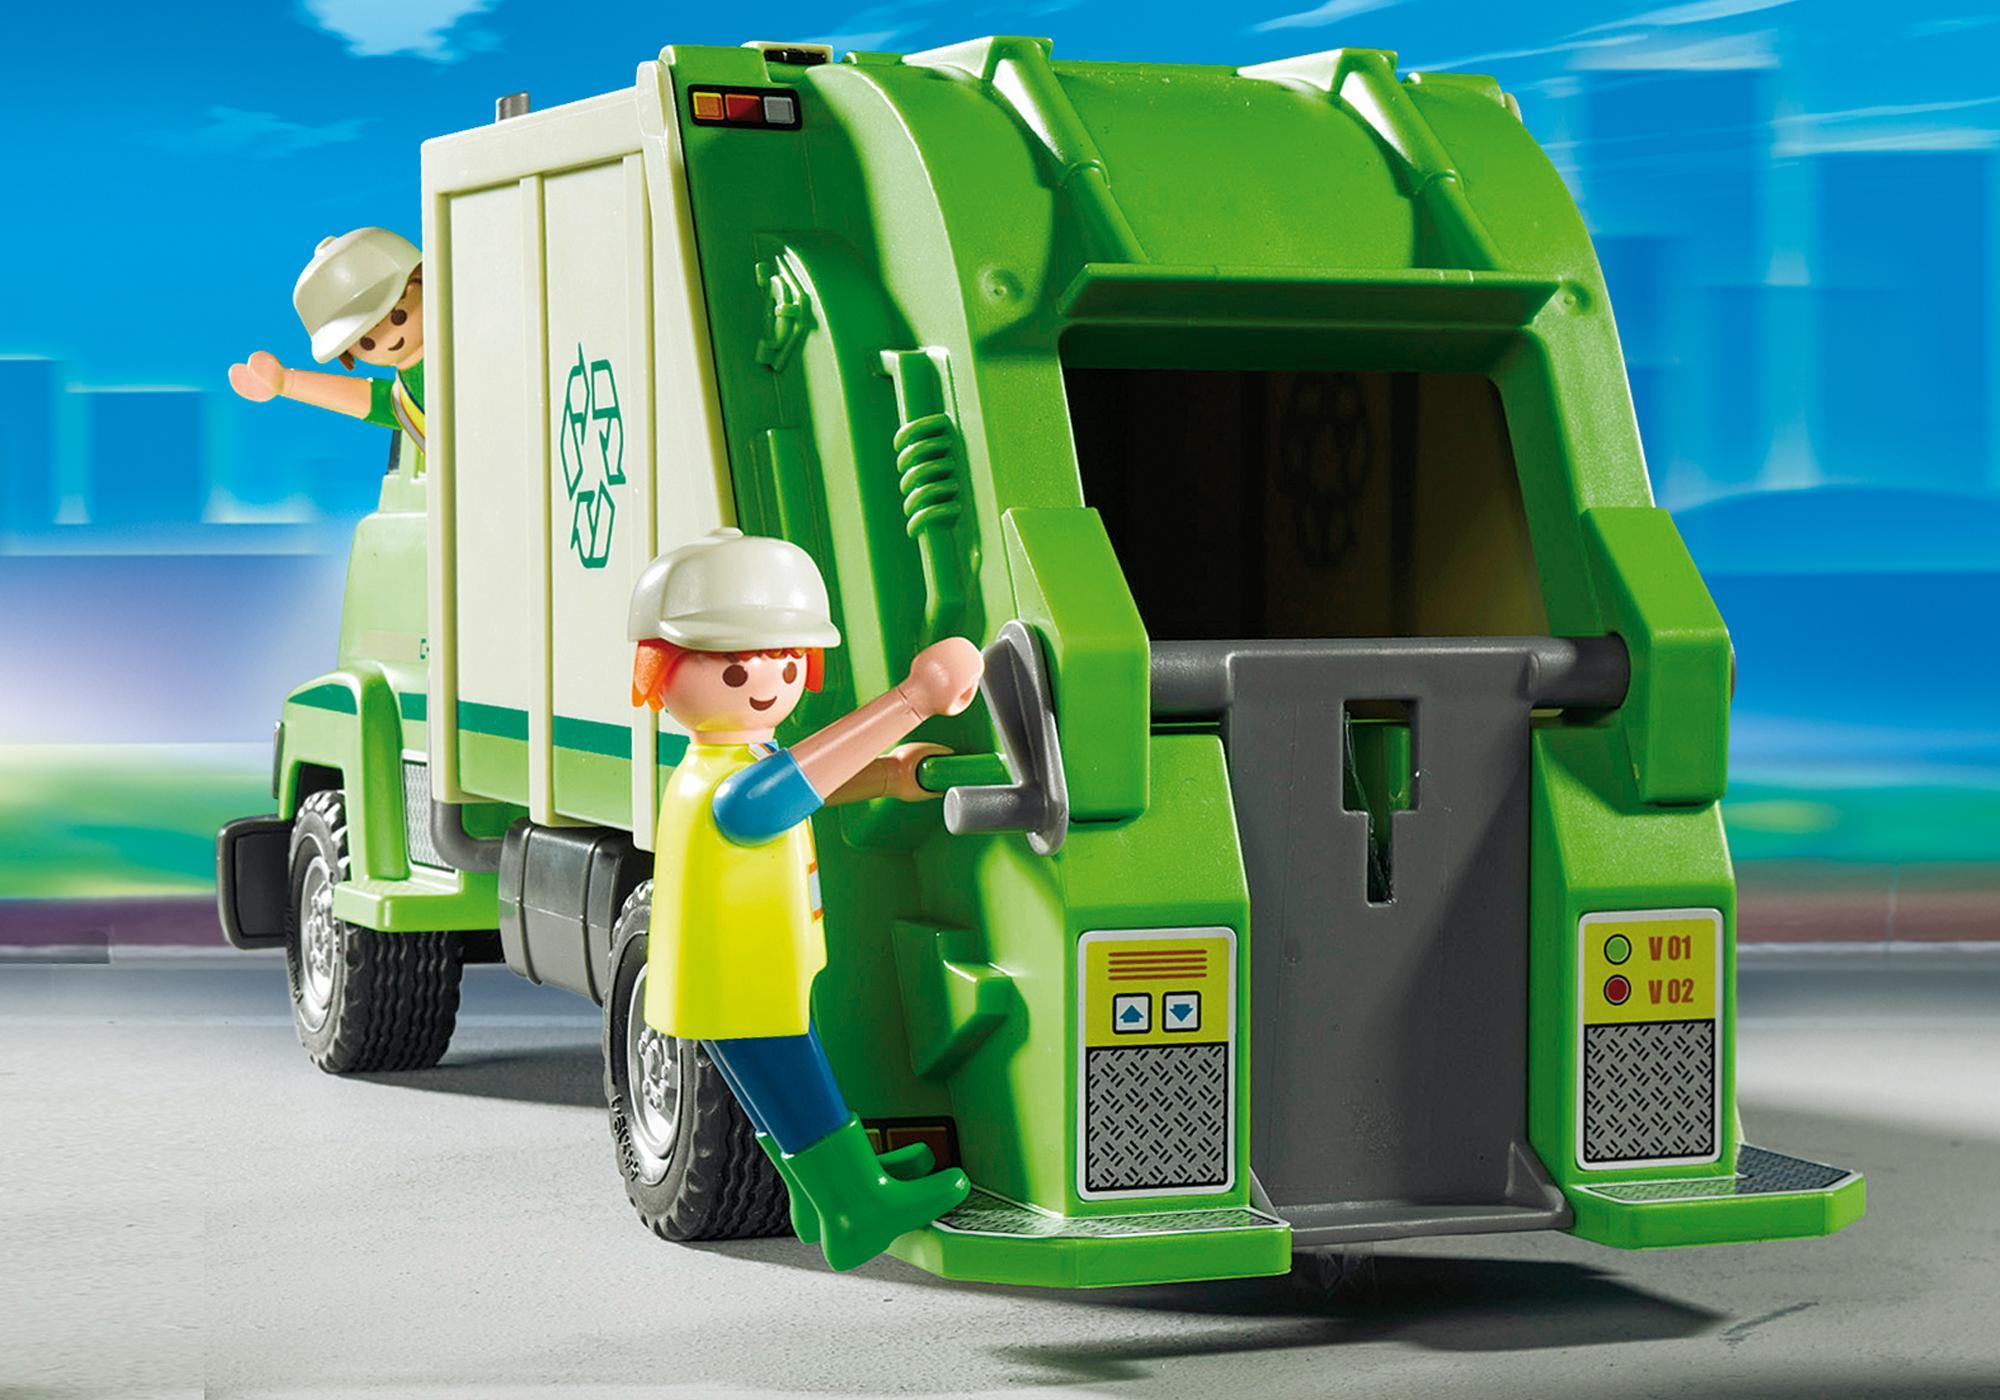 http://media.playmobil.com/i/playmobil/5679_product_extra1/Recycling Truck